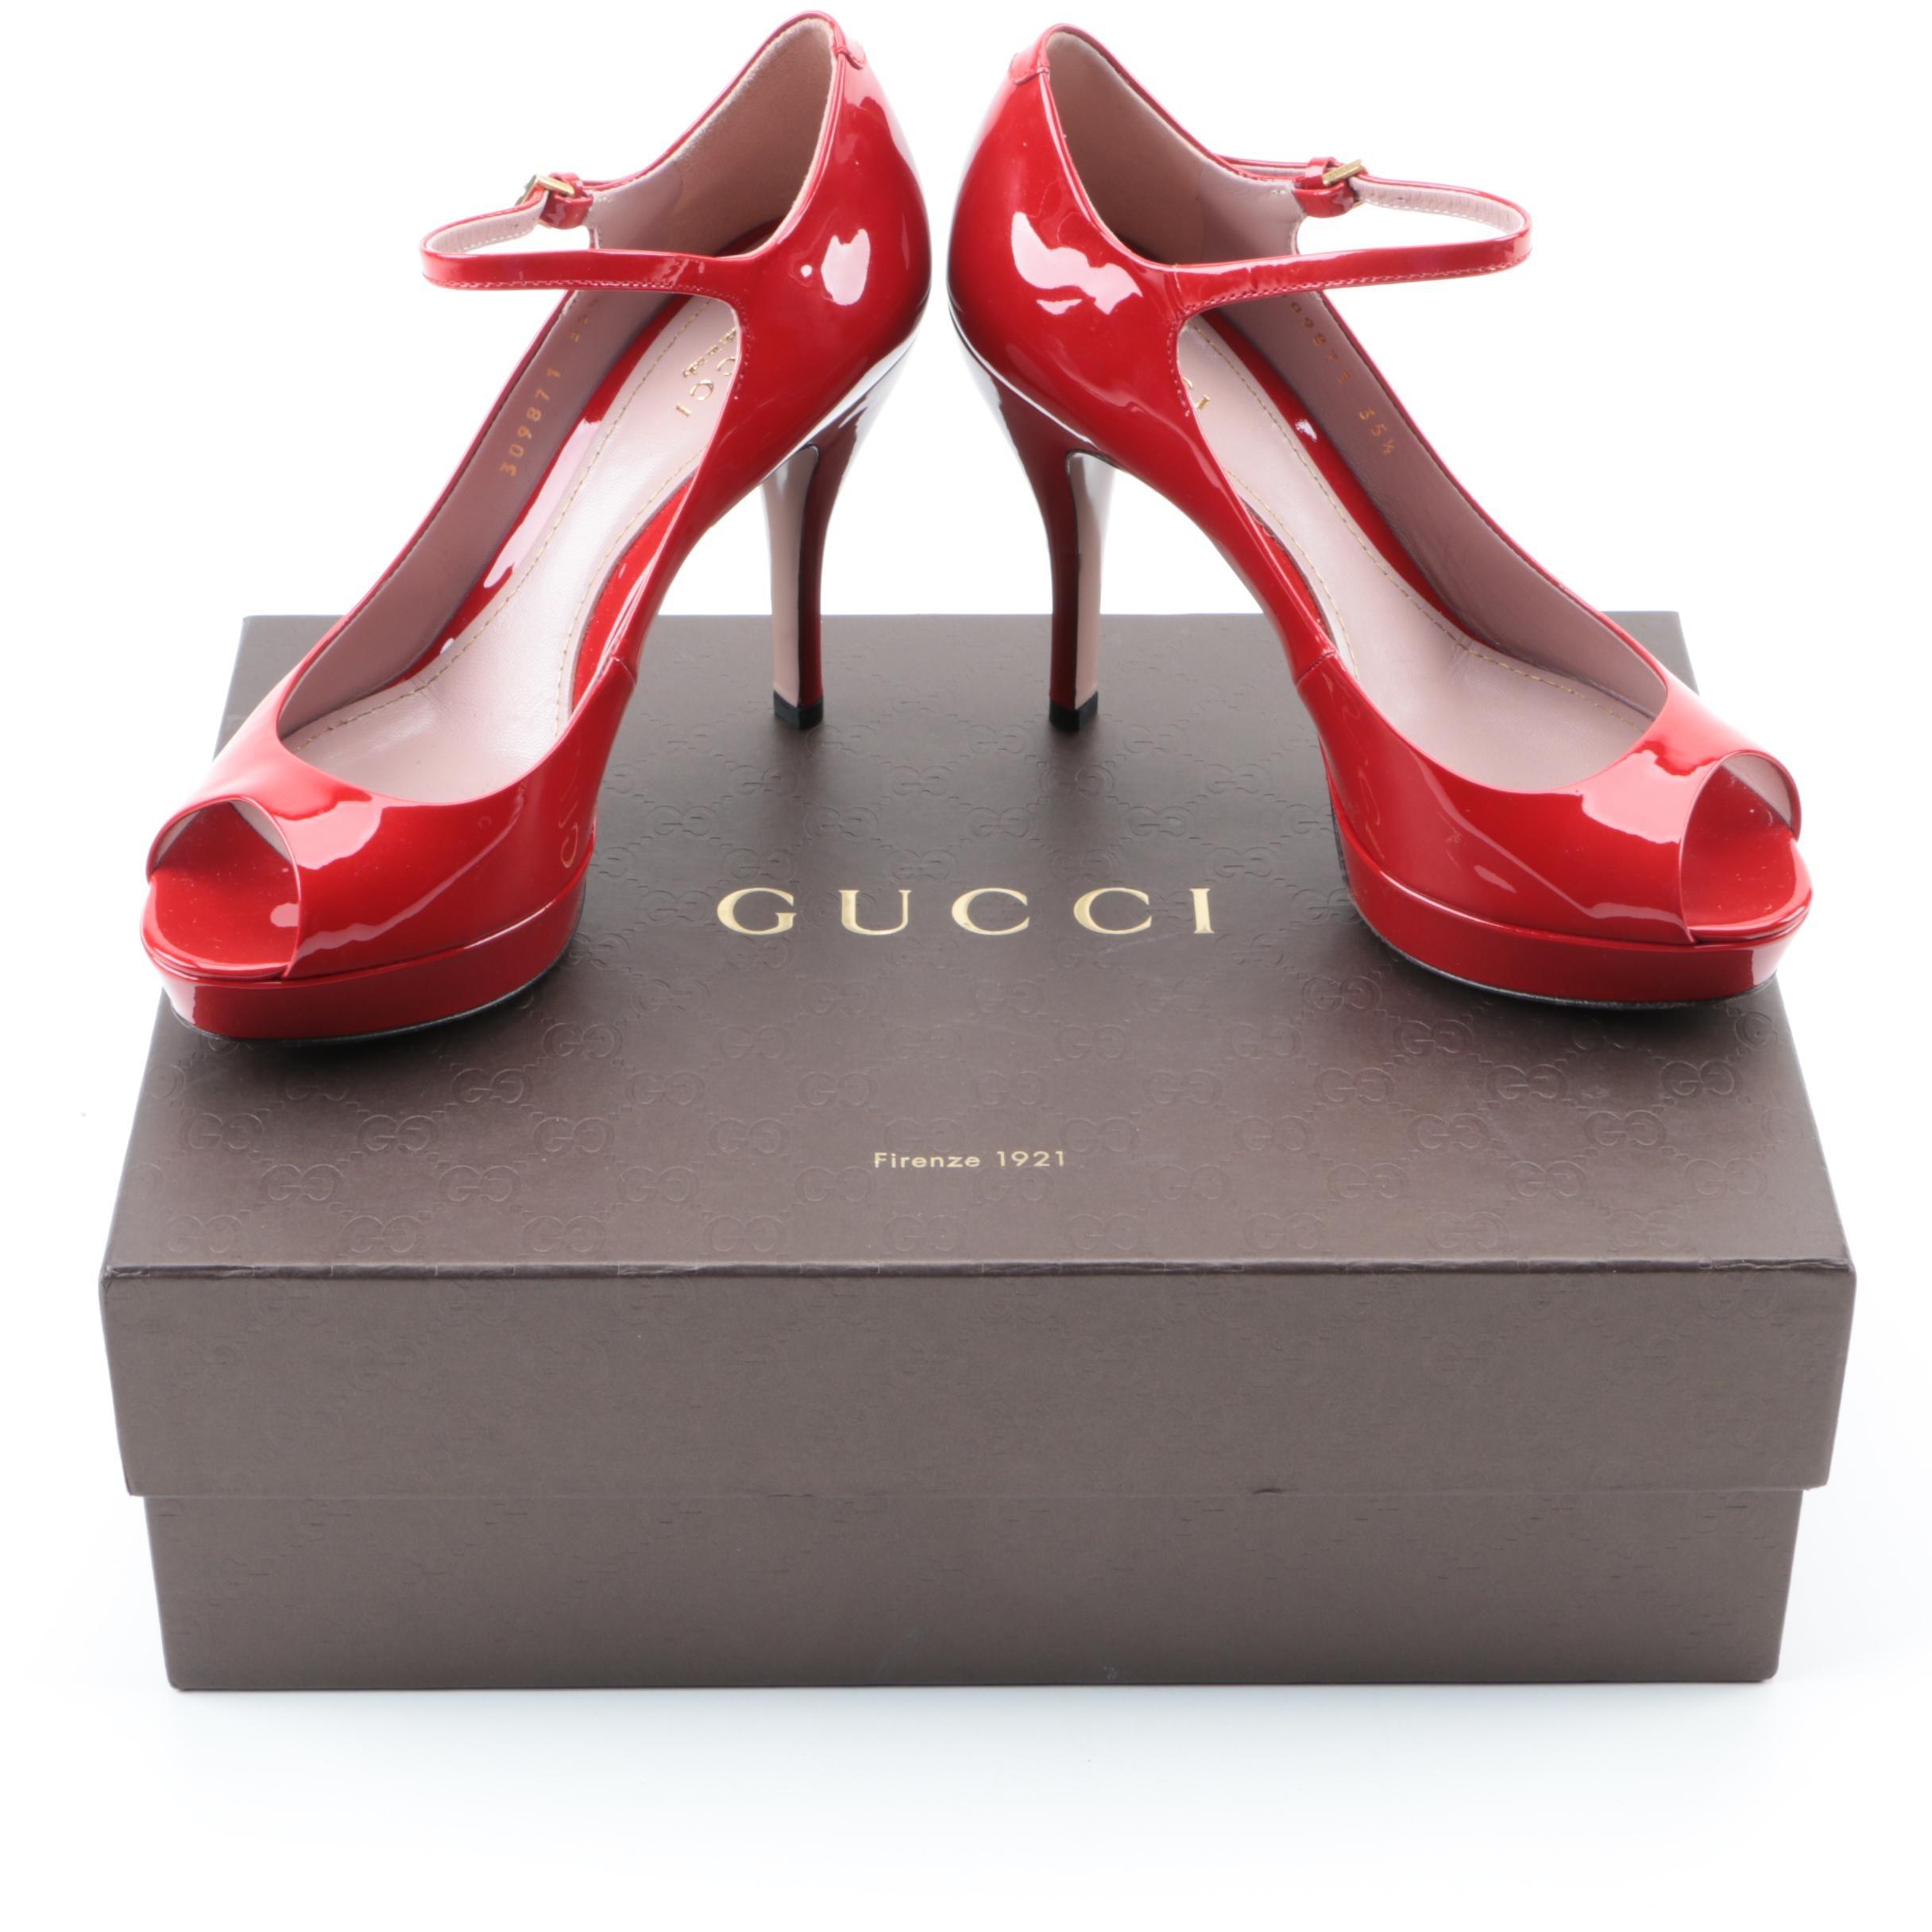 Gucci Patent Leather Peep Toe Heels